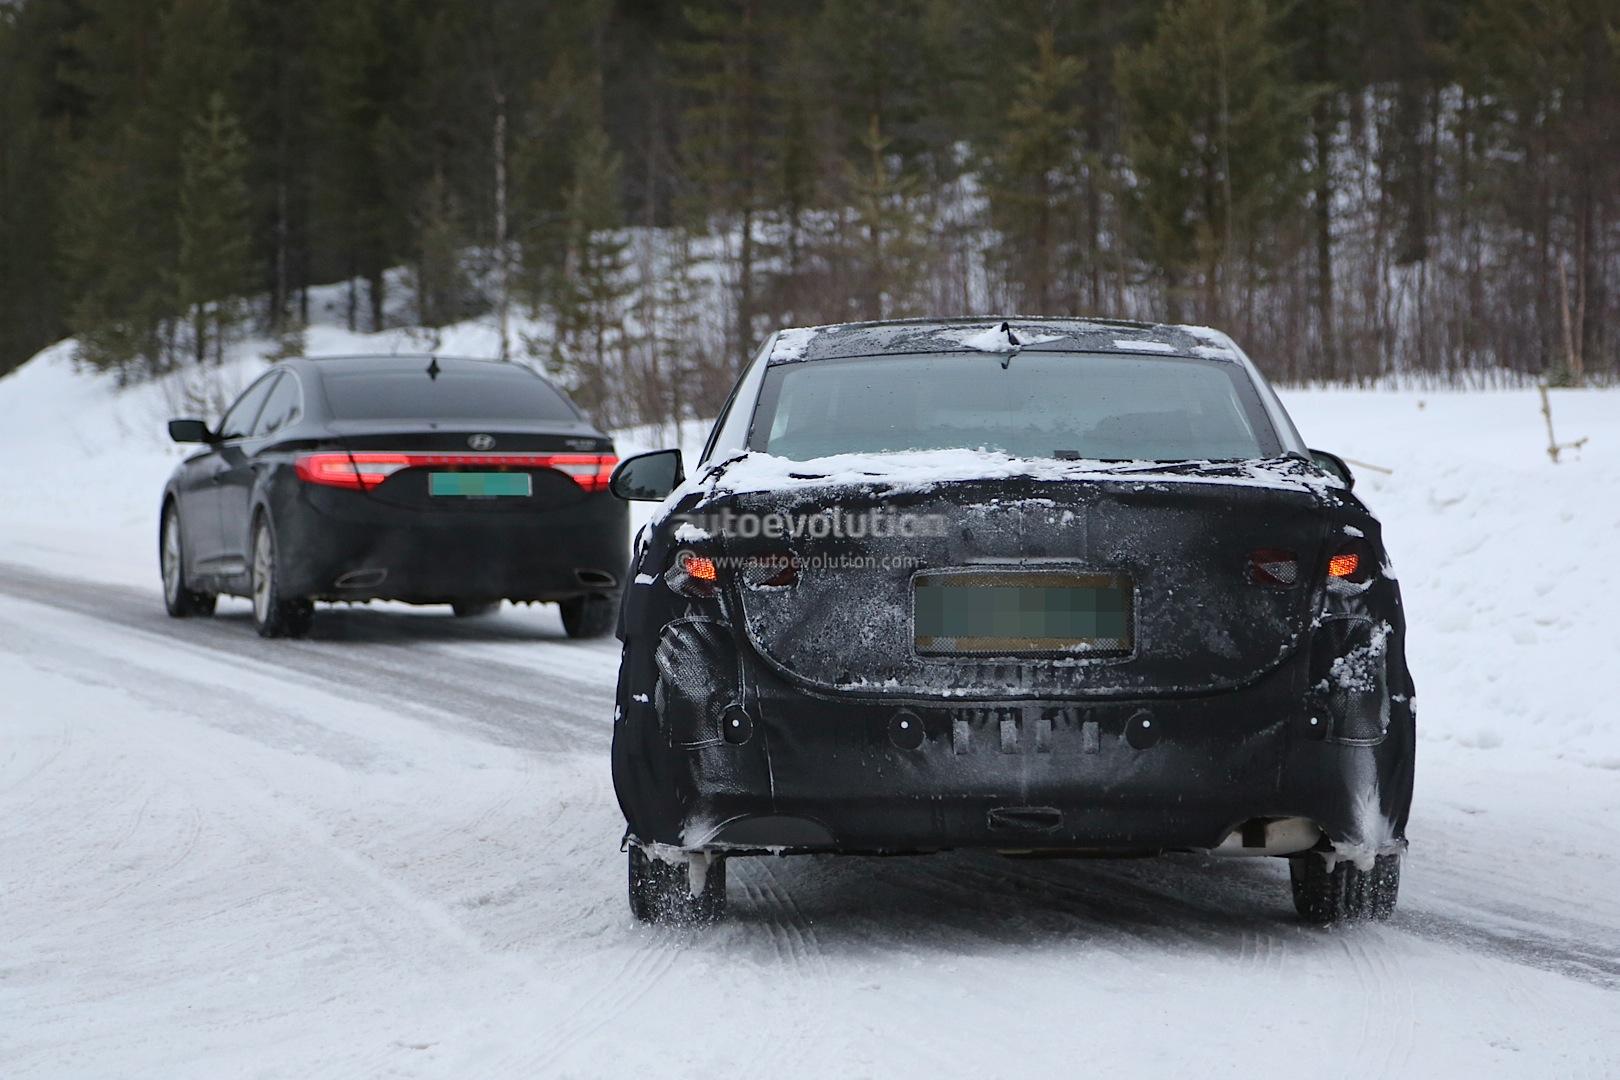 Spyshots: 2015 Hyundai Sonata Photos Show Hybrid Model for ...